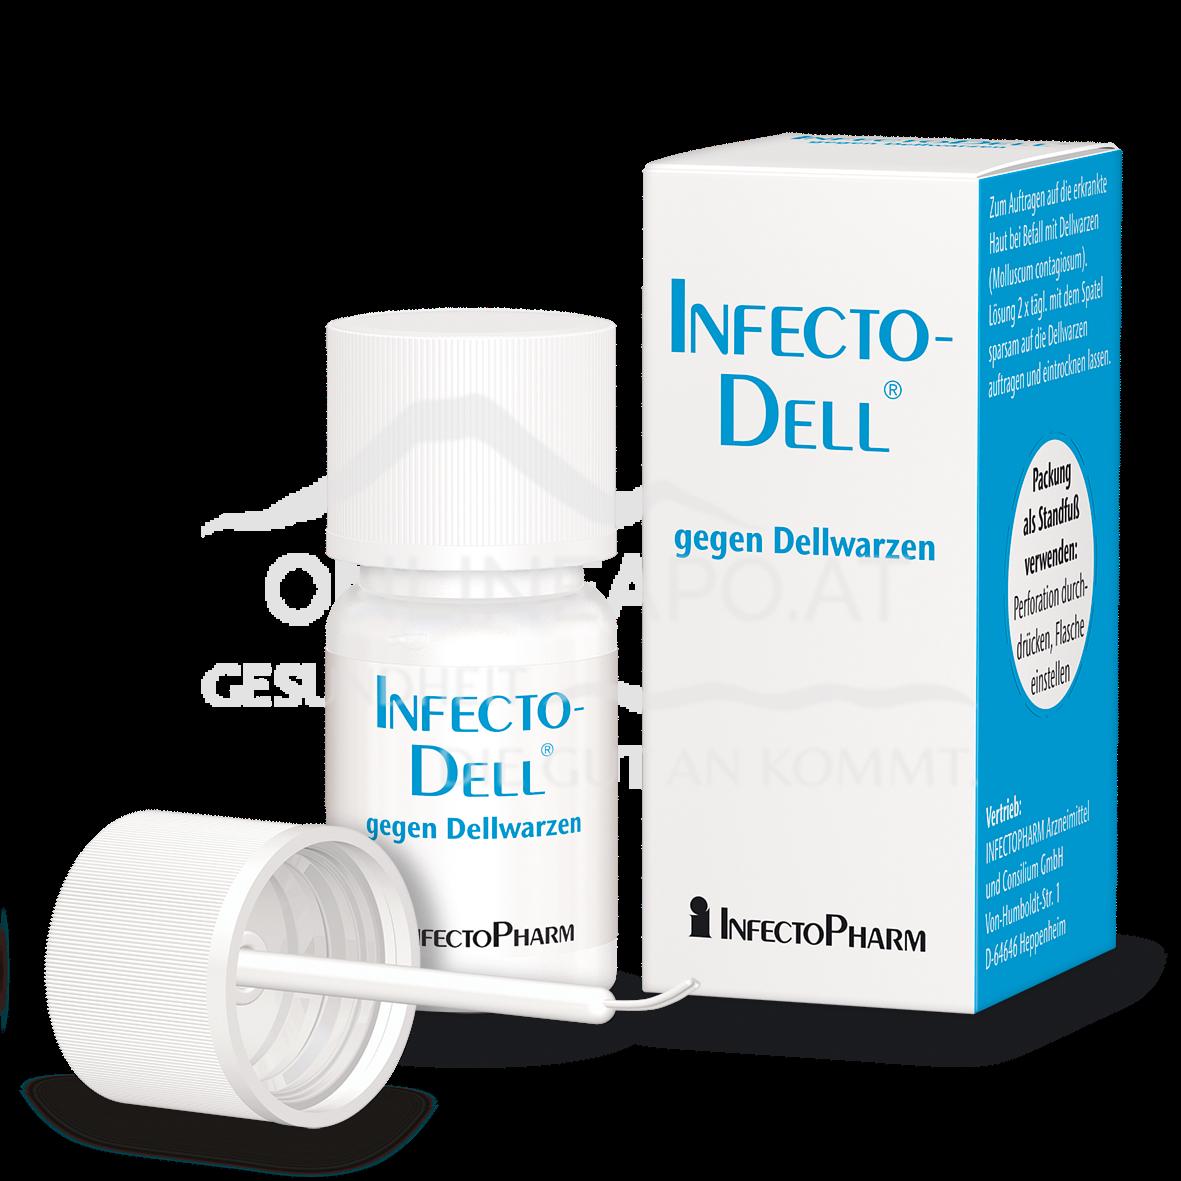 Infectodell Lösung gegen Dellwarzen